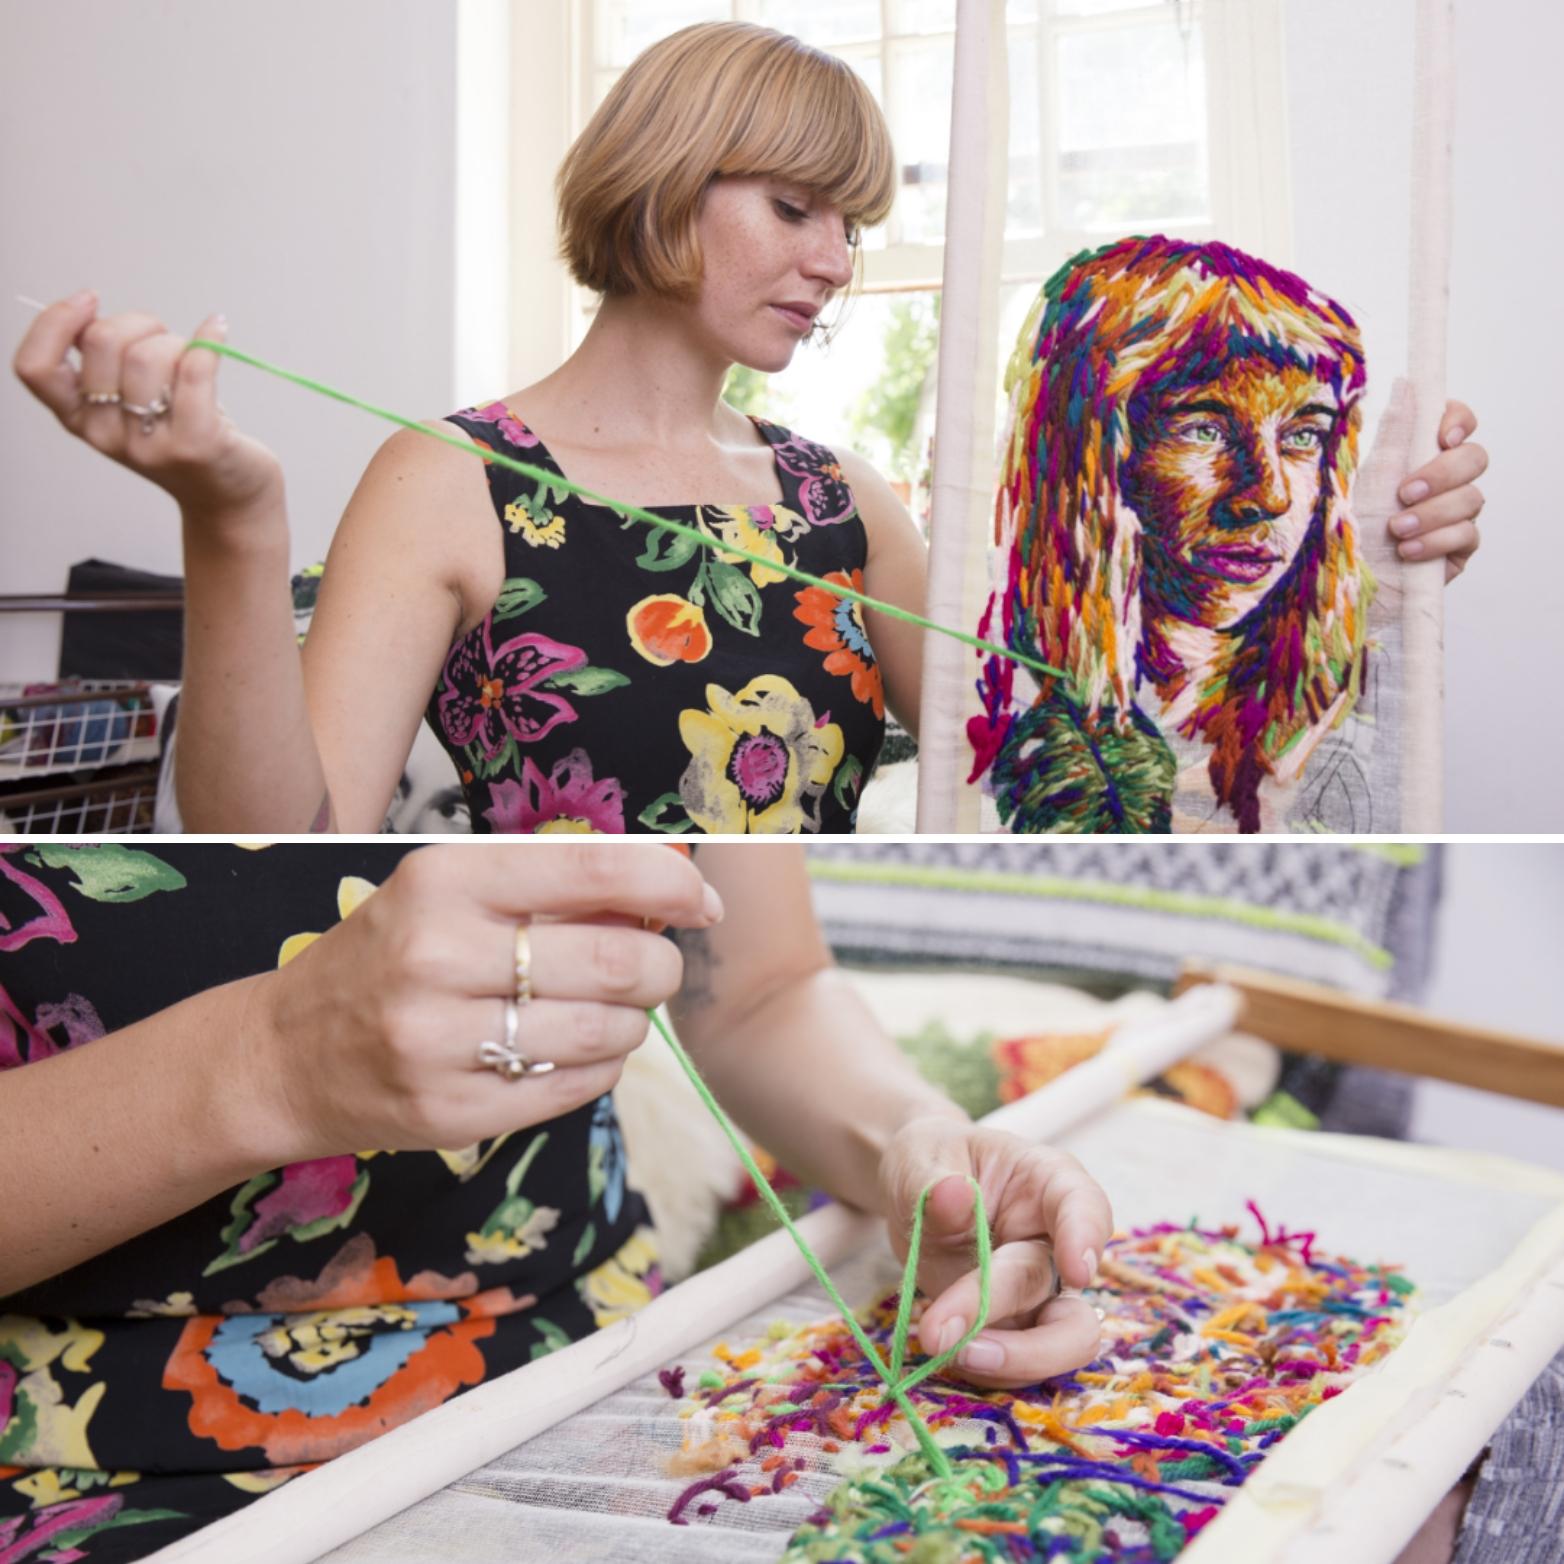 Danielle Clough working in her studio Photo by Lesca Lea